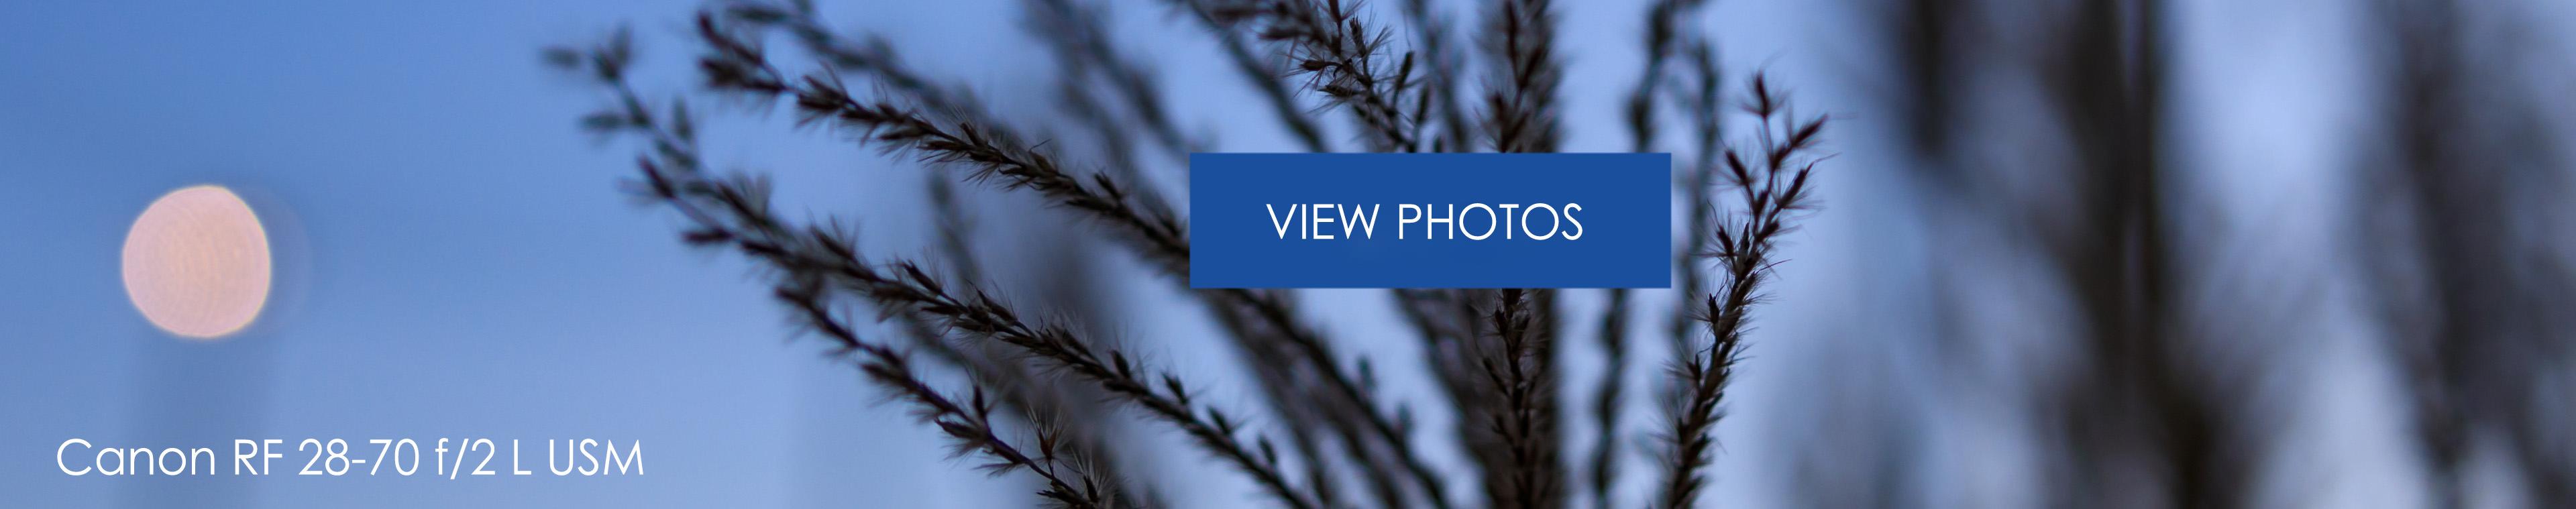 RF28 70 Viewfoto3840